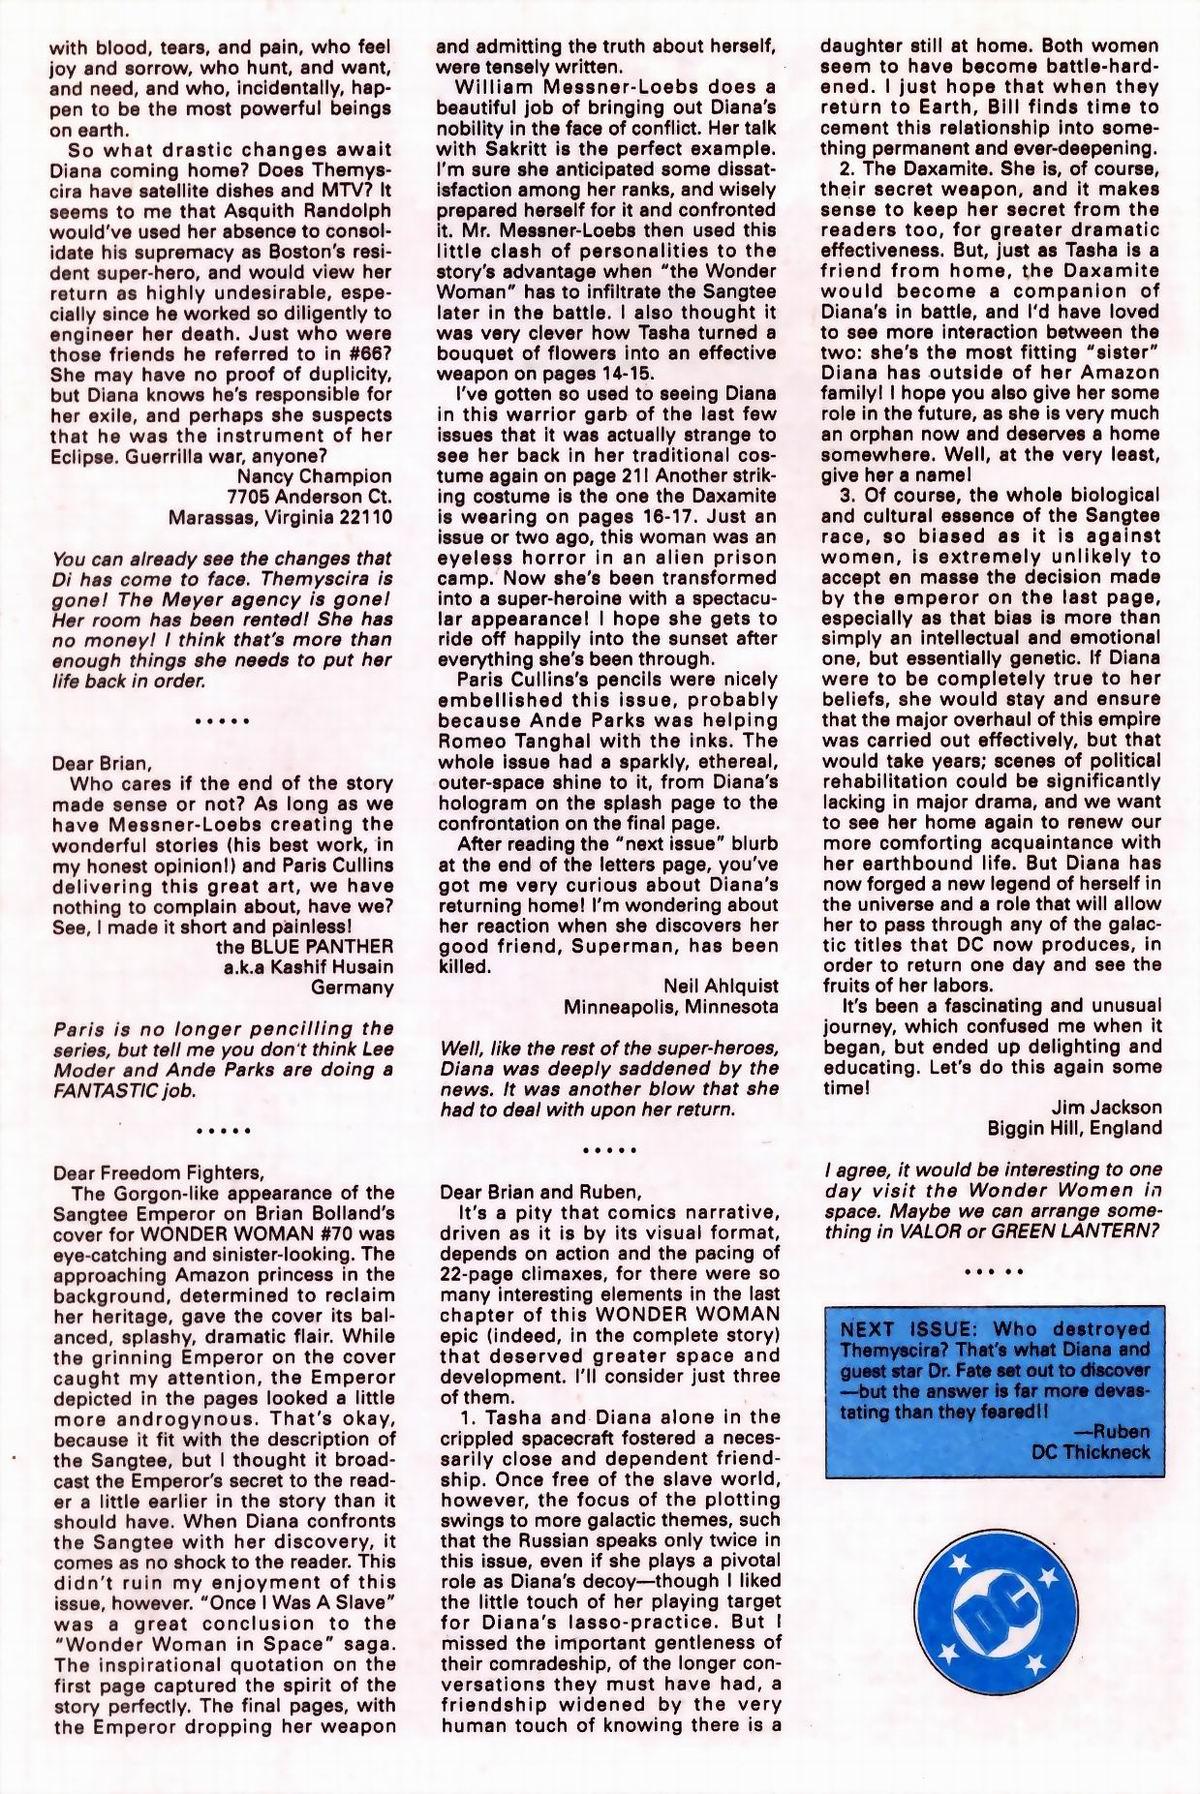 Read online Wonder Woman (1987) comic -  Issue #76 - 24